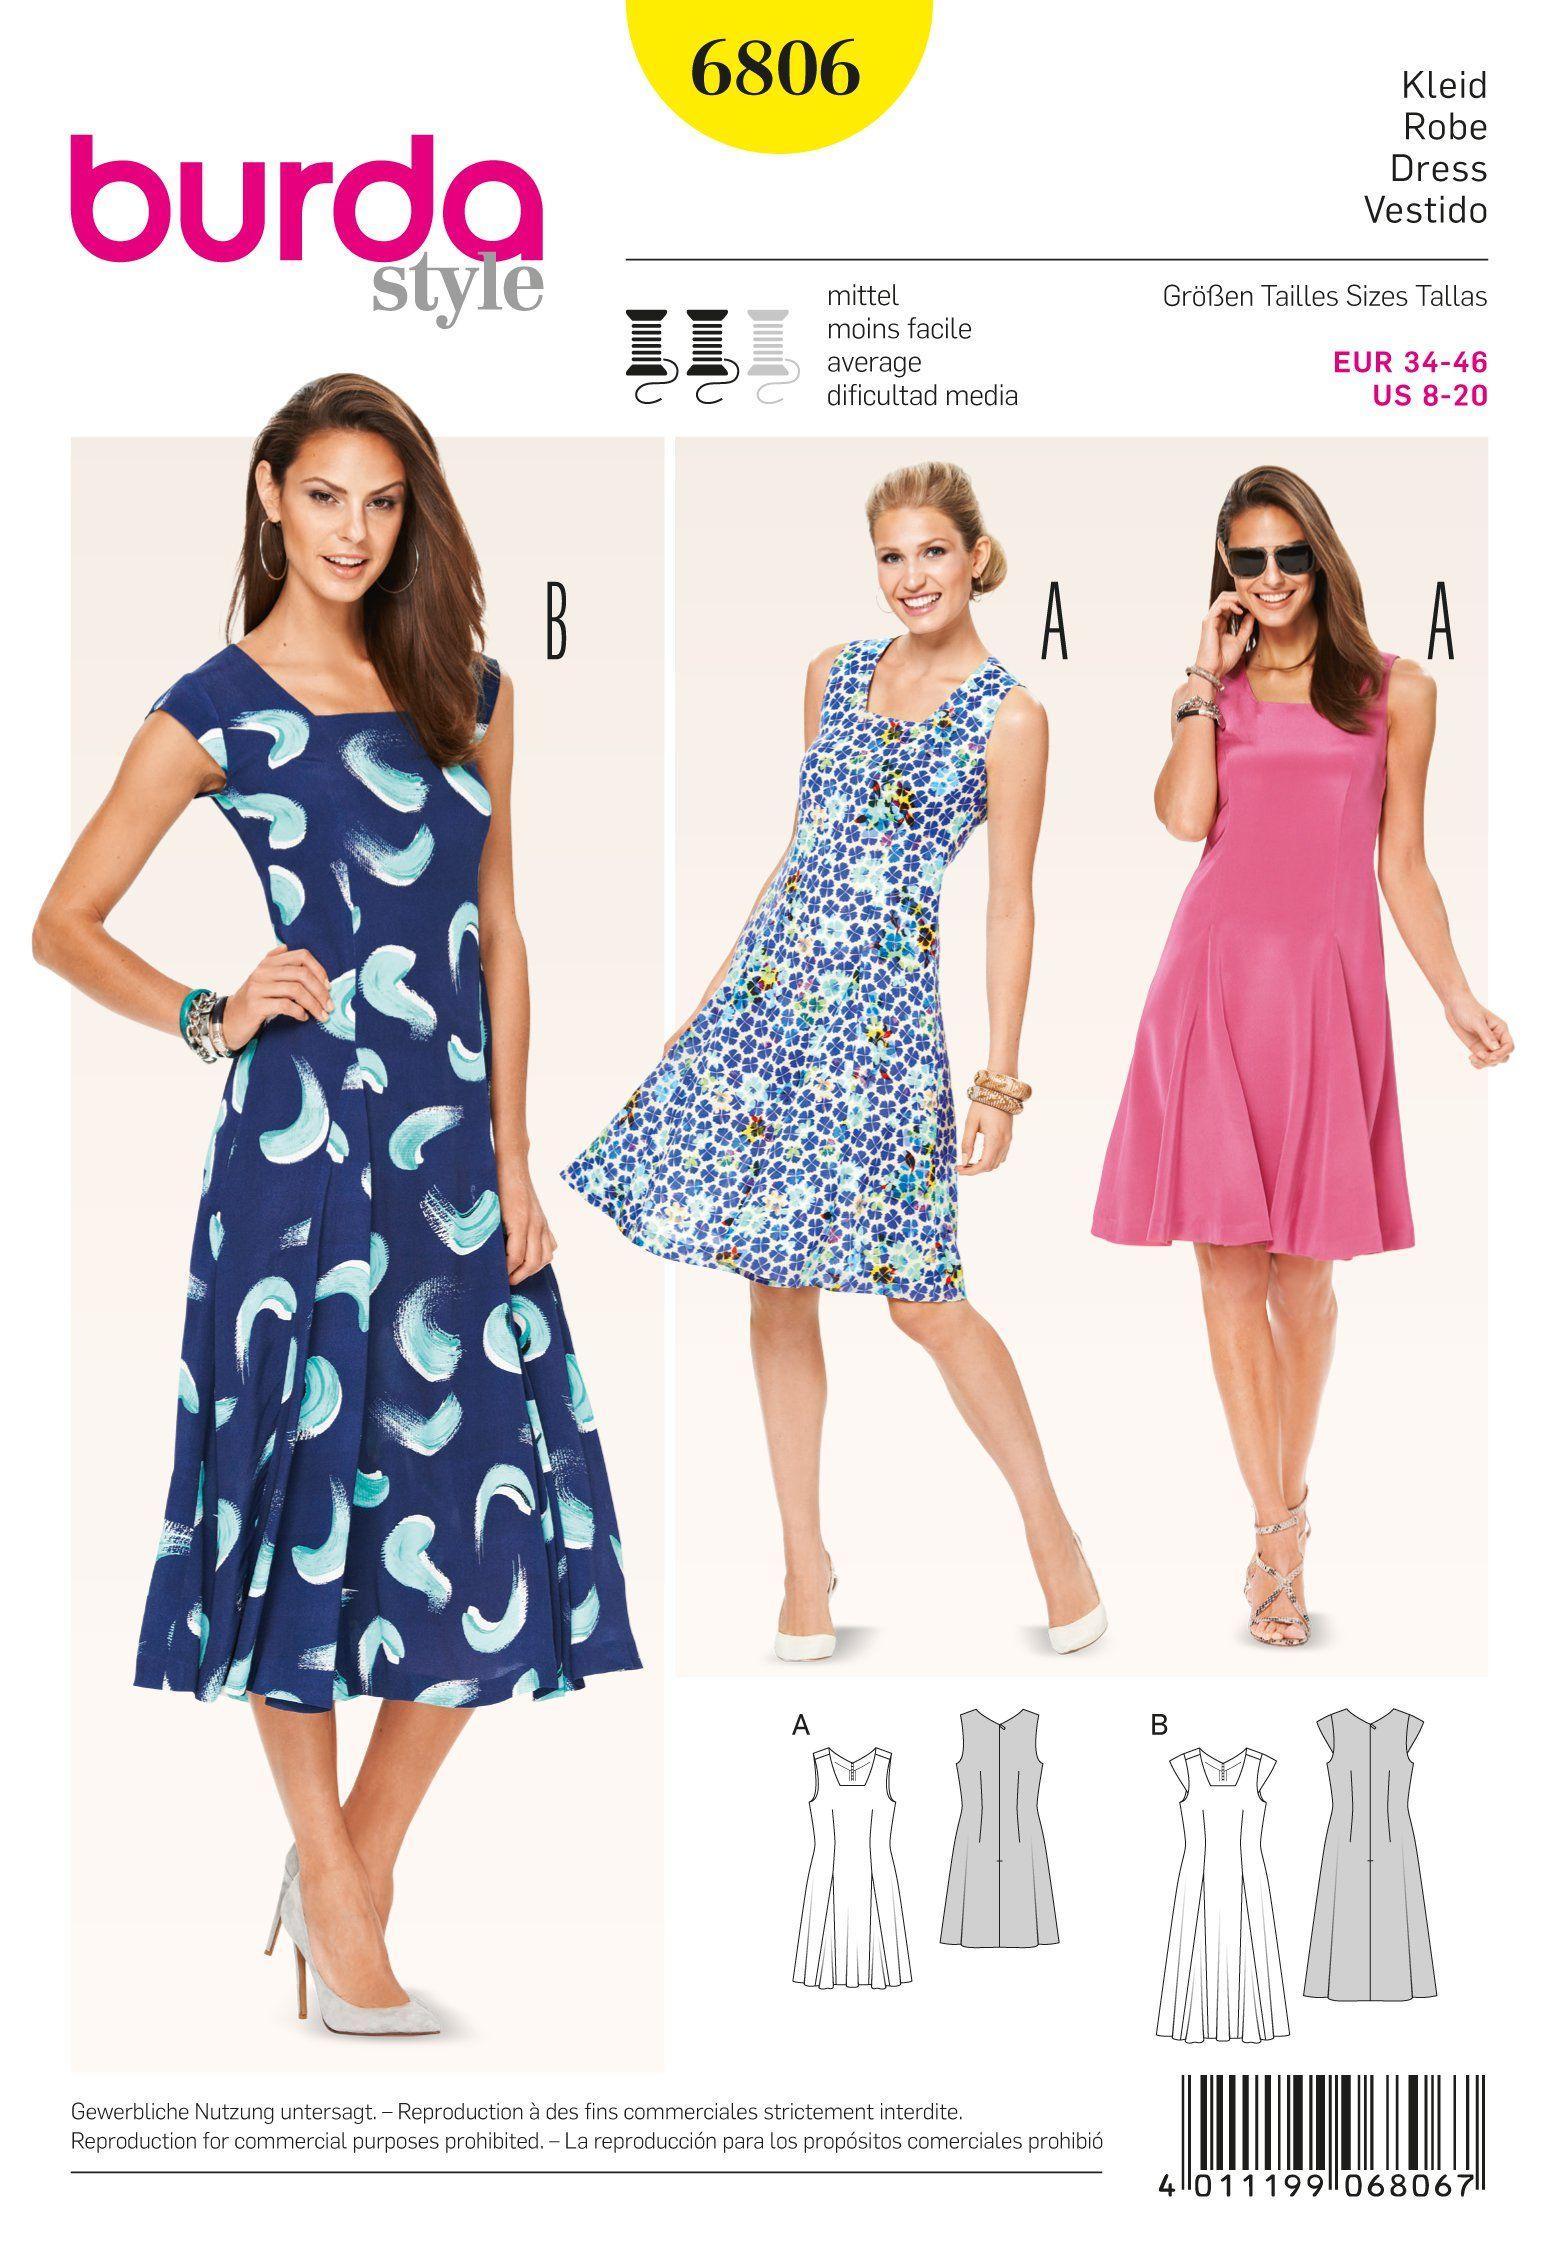 Burda 6806 Burda Style Dresses Dress Sewing Patterns Summer Dress Patterns Sewing Dresses [ 2244 x 1559 Pixel ]